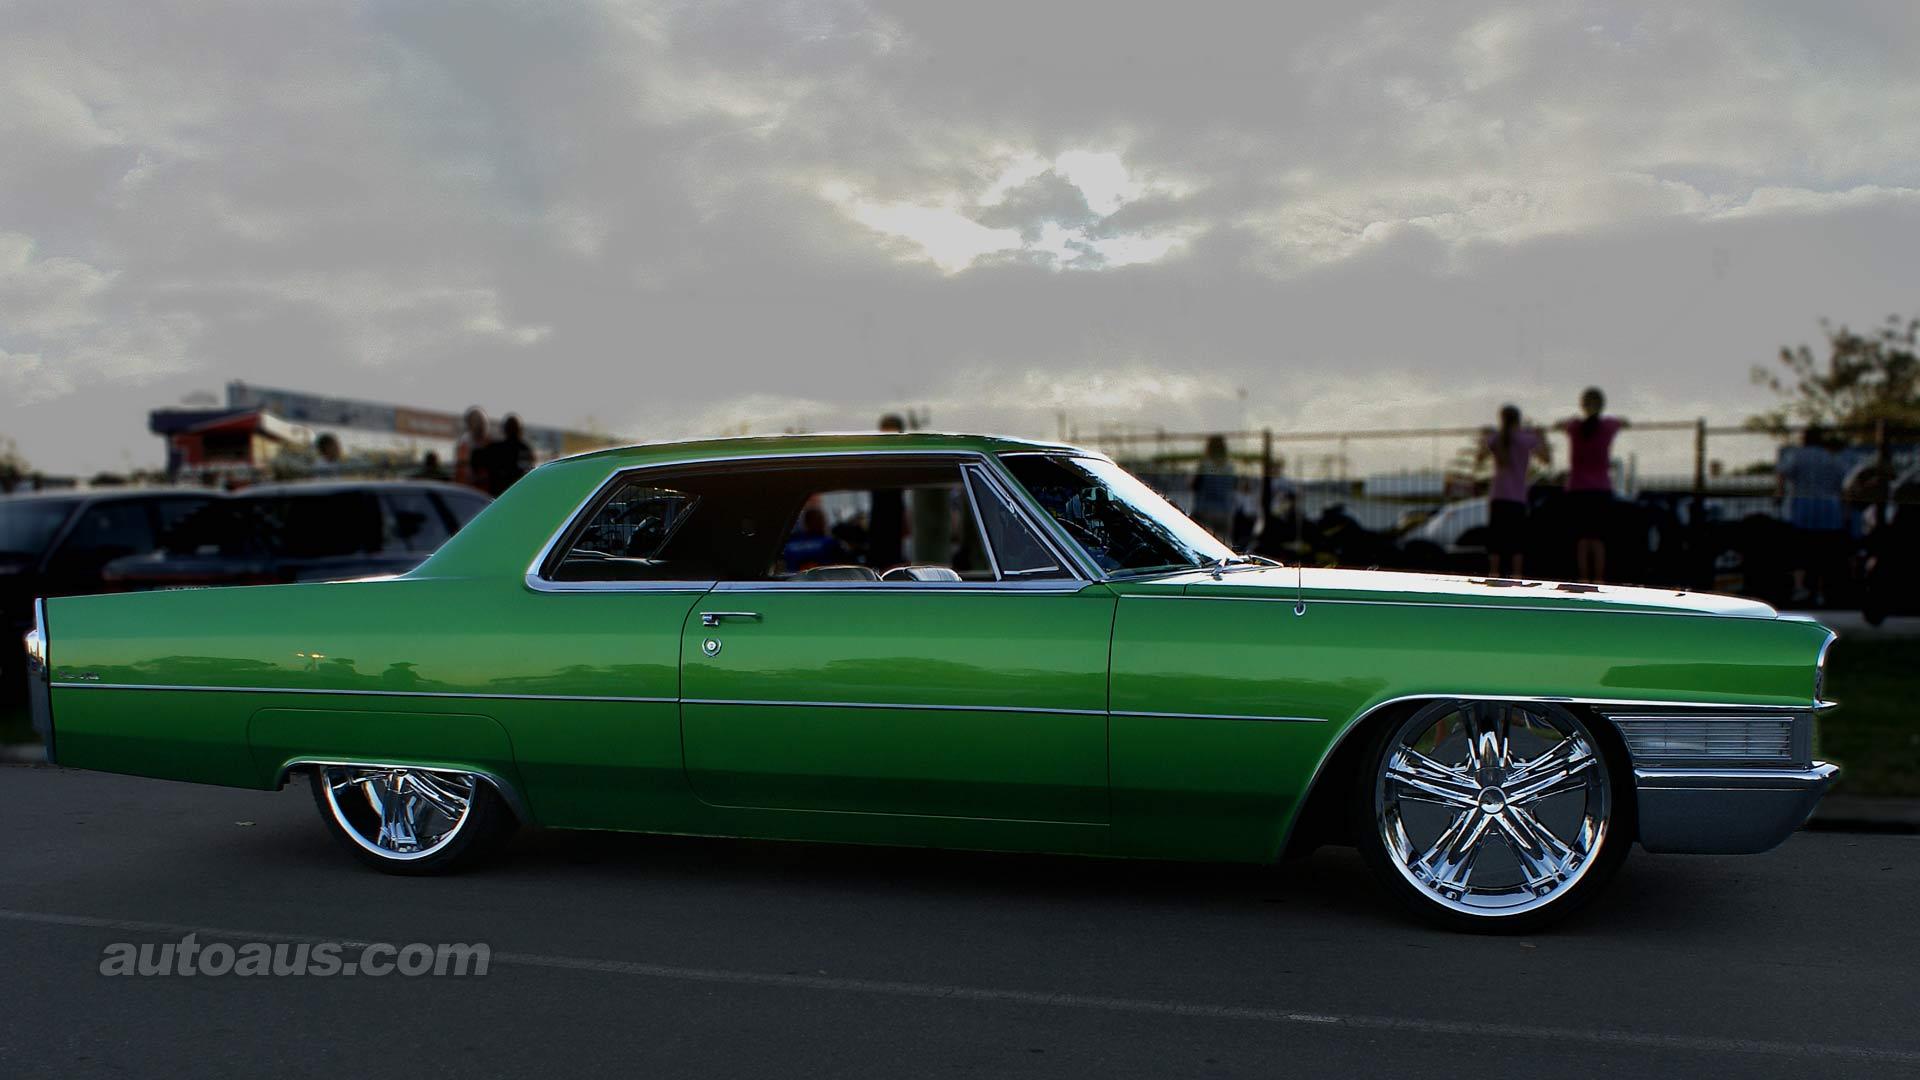 Muscle Cars Com Widescreen Car Custom Caddy Lexus 142879 Wallpaper